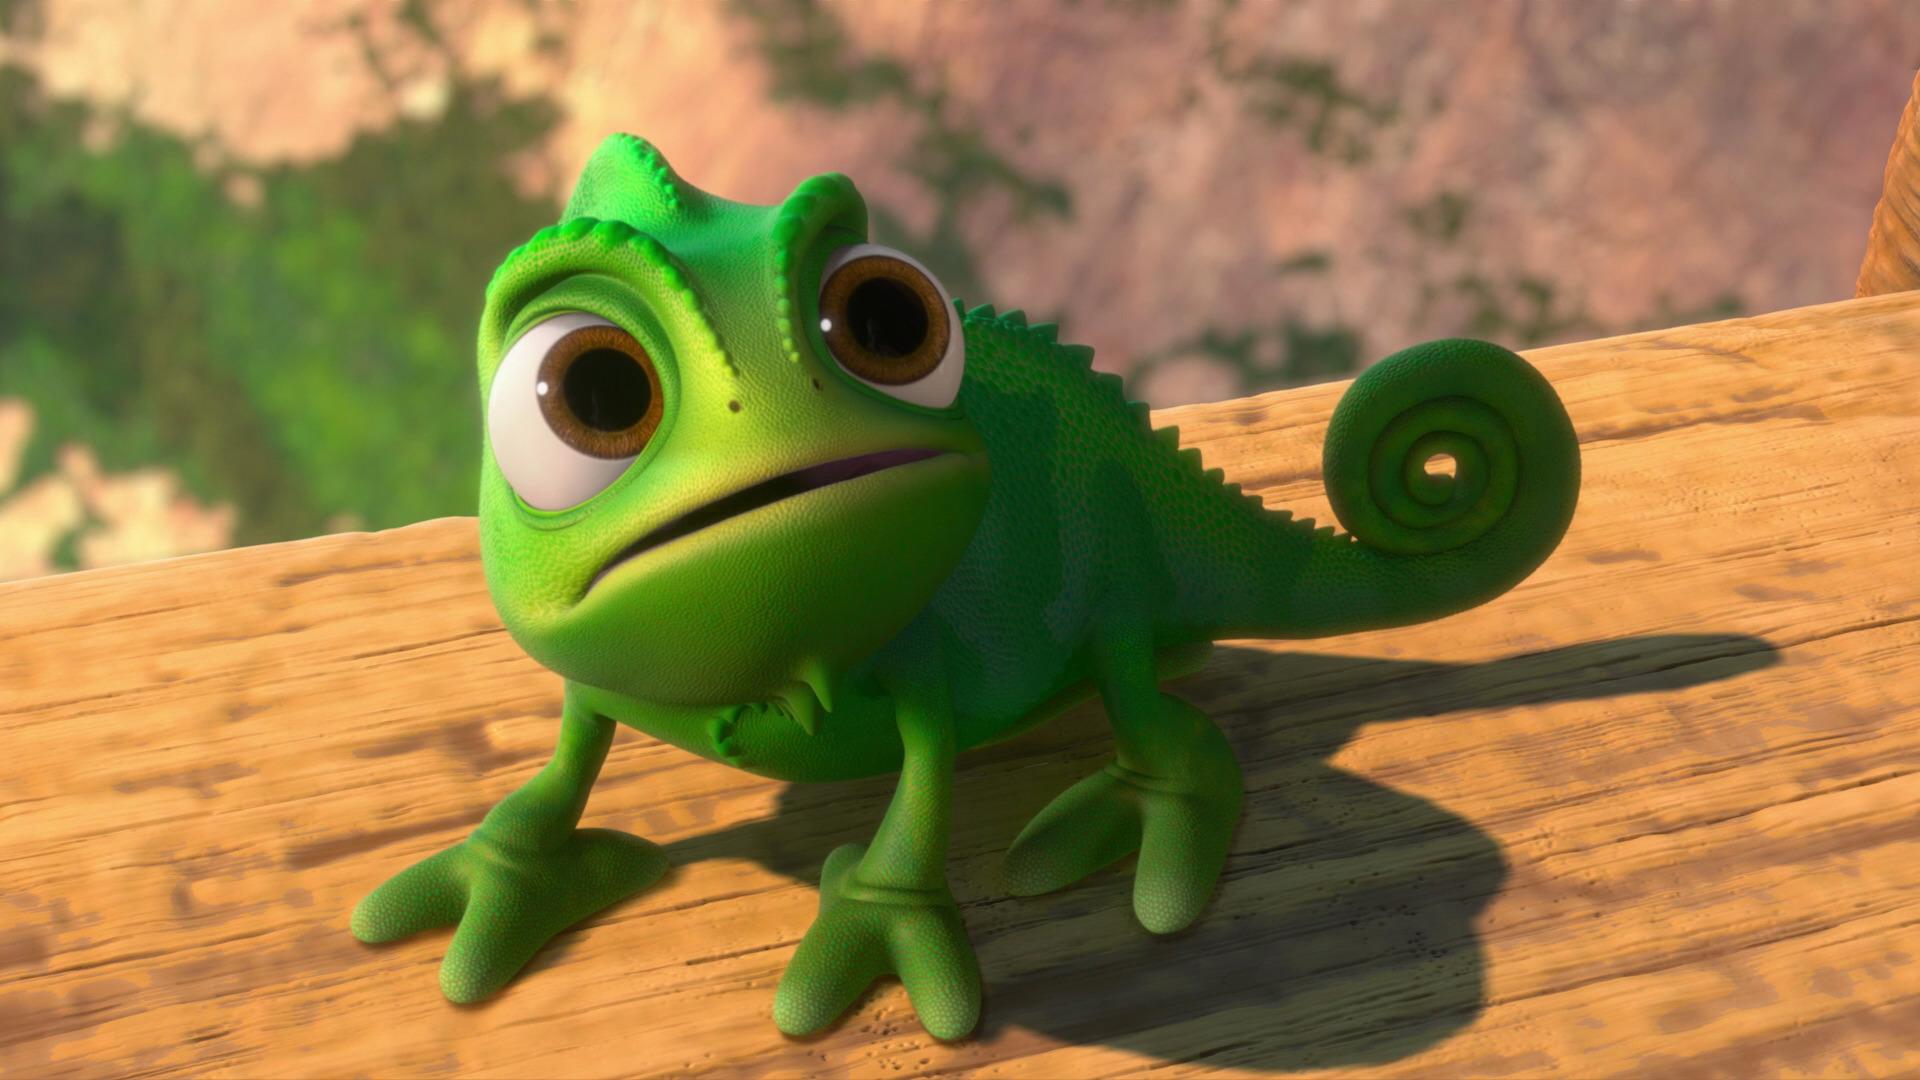 Pascal personnage dans raiponce disney planet - Raiponce cameleon ...